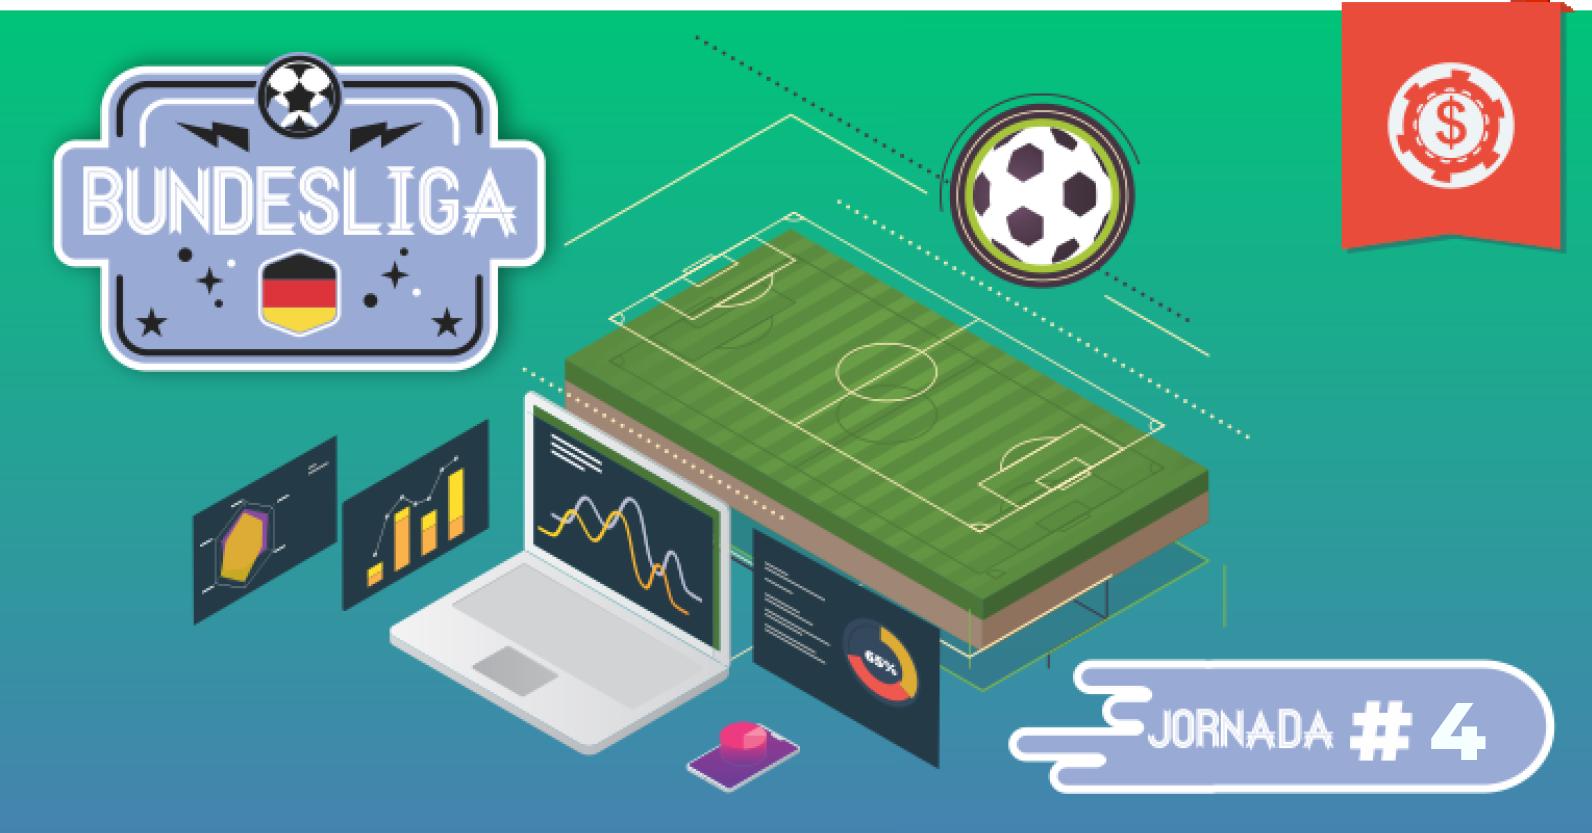 pronosticos-bundesliga-liga-alemana-apuestas-jornada-4